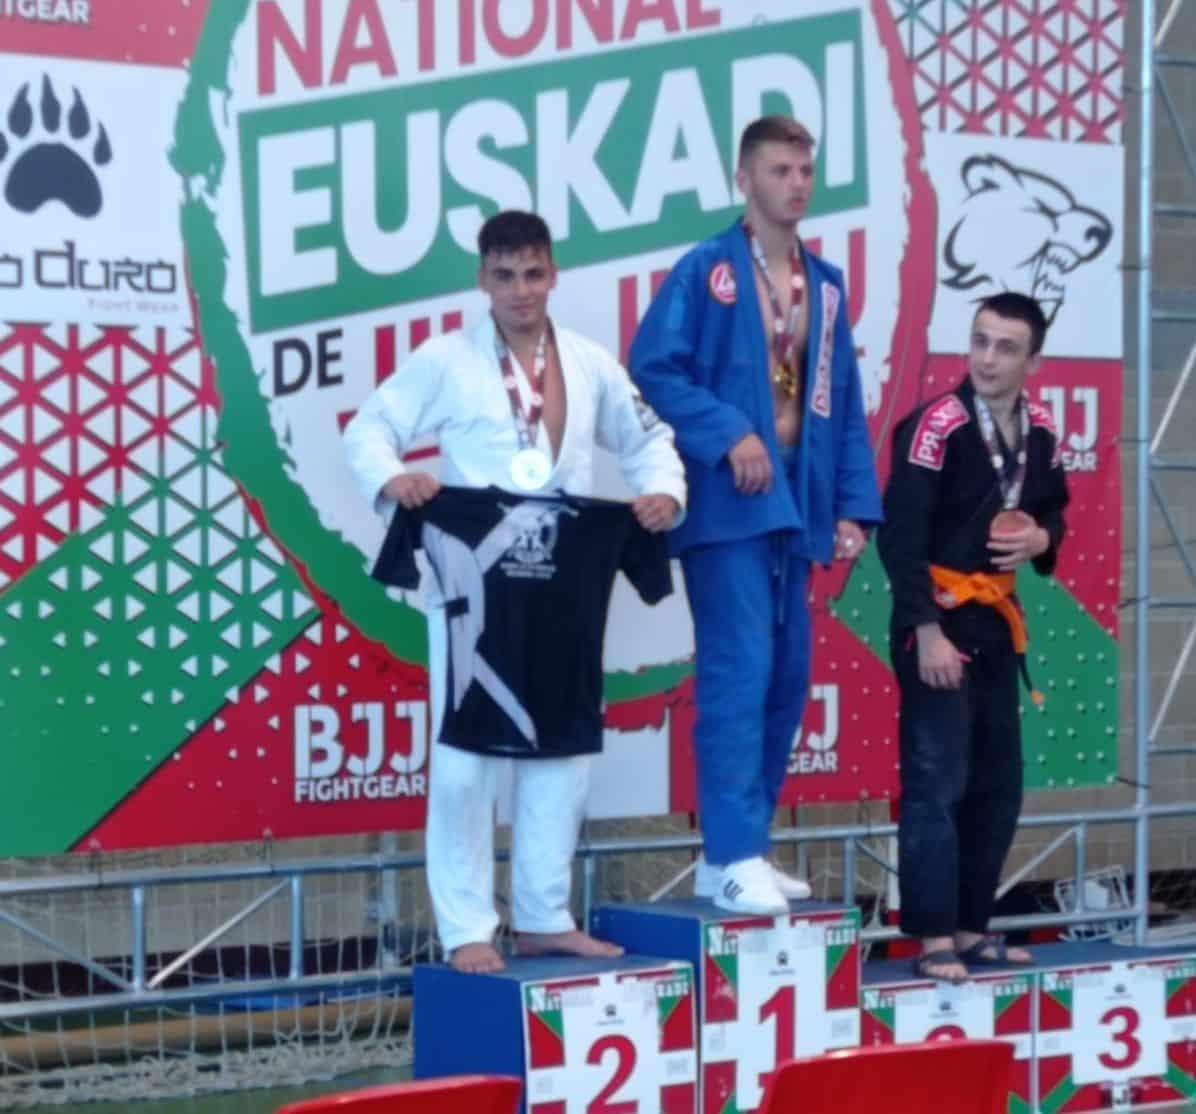 Gran papel del Haro Fight en el Campeonato de Euskadi de Jiu-jitsu 1